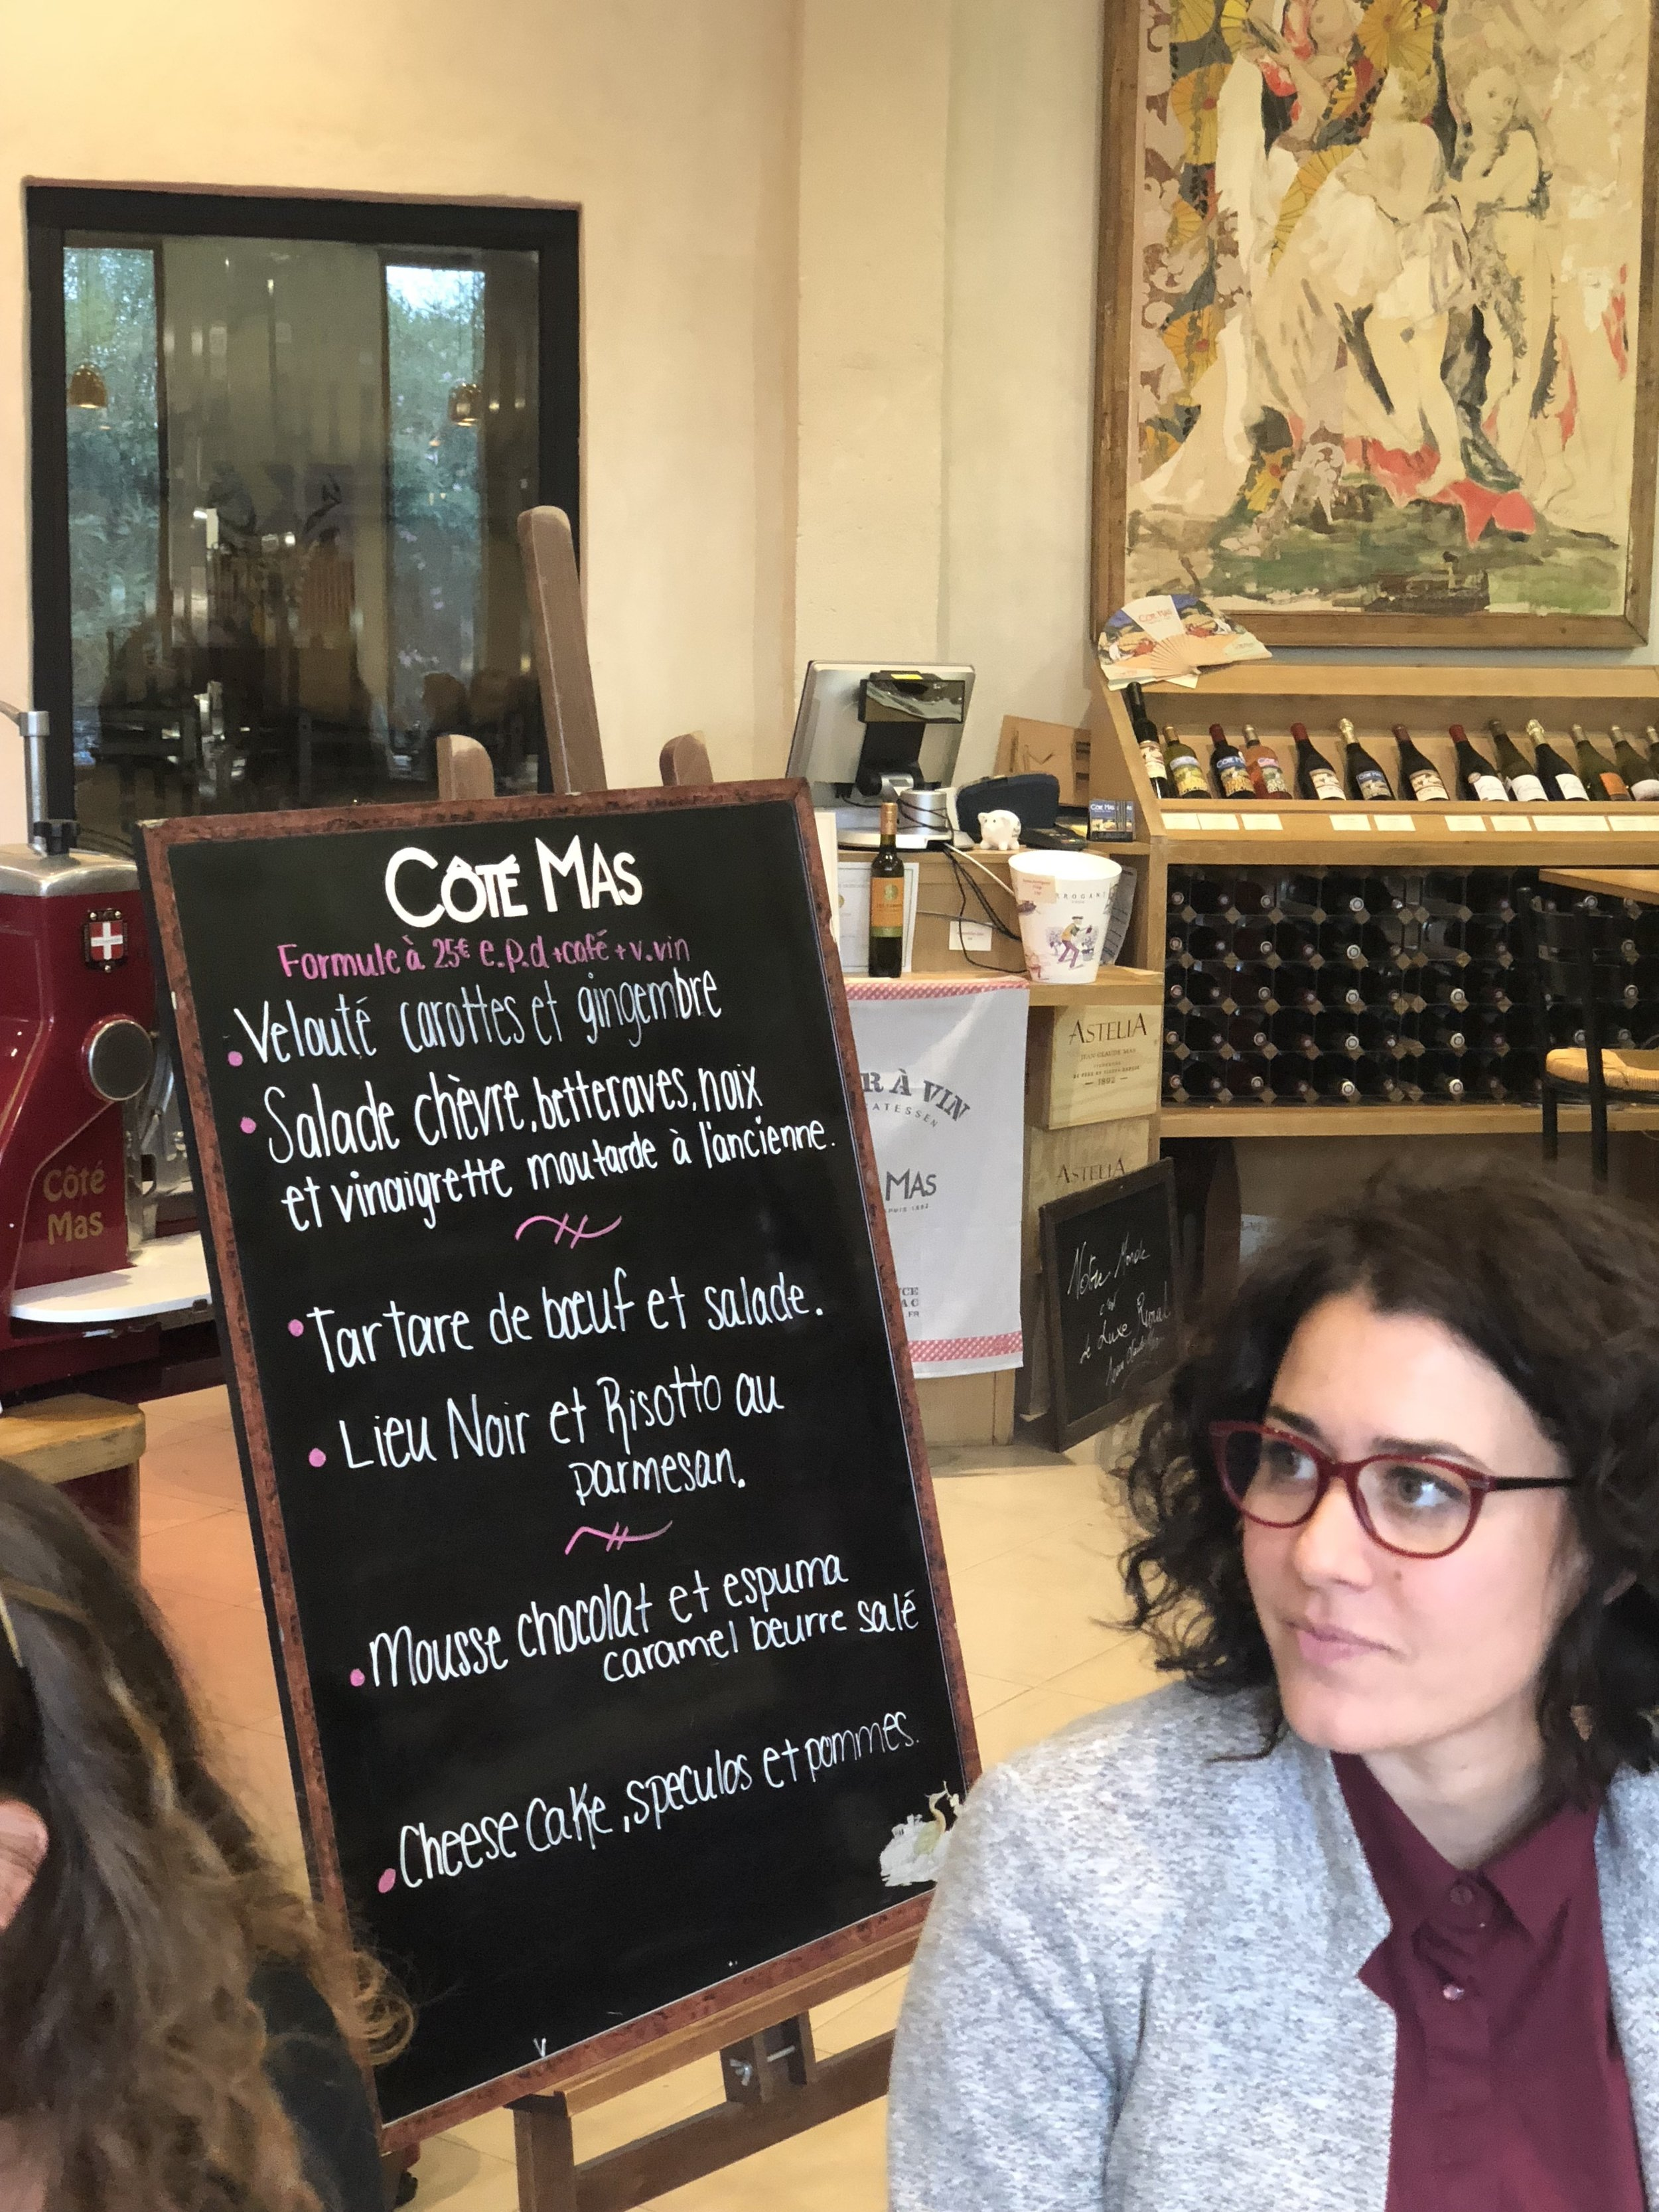 Menu at Restaurant Cote Mas (Image: Sumita Sarma)